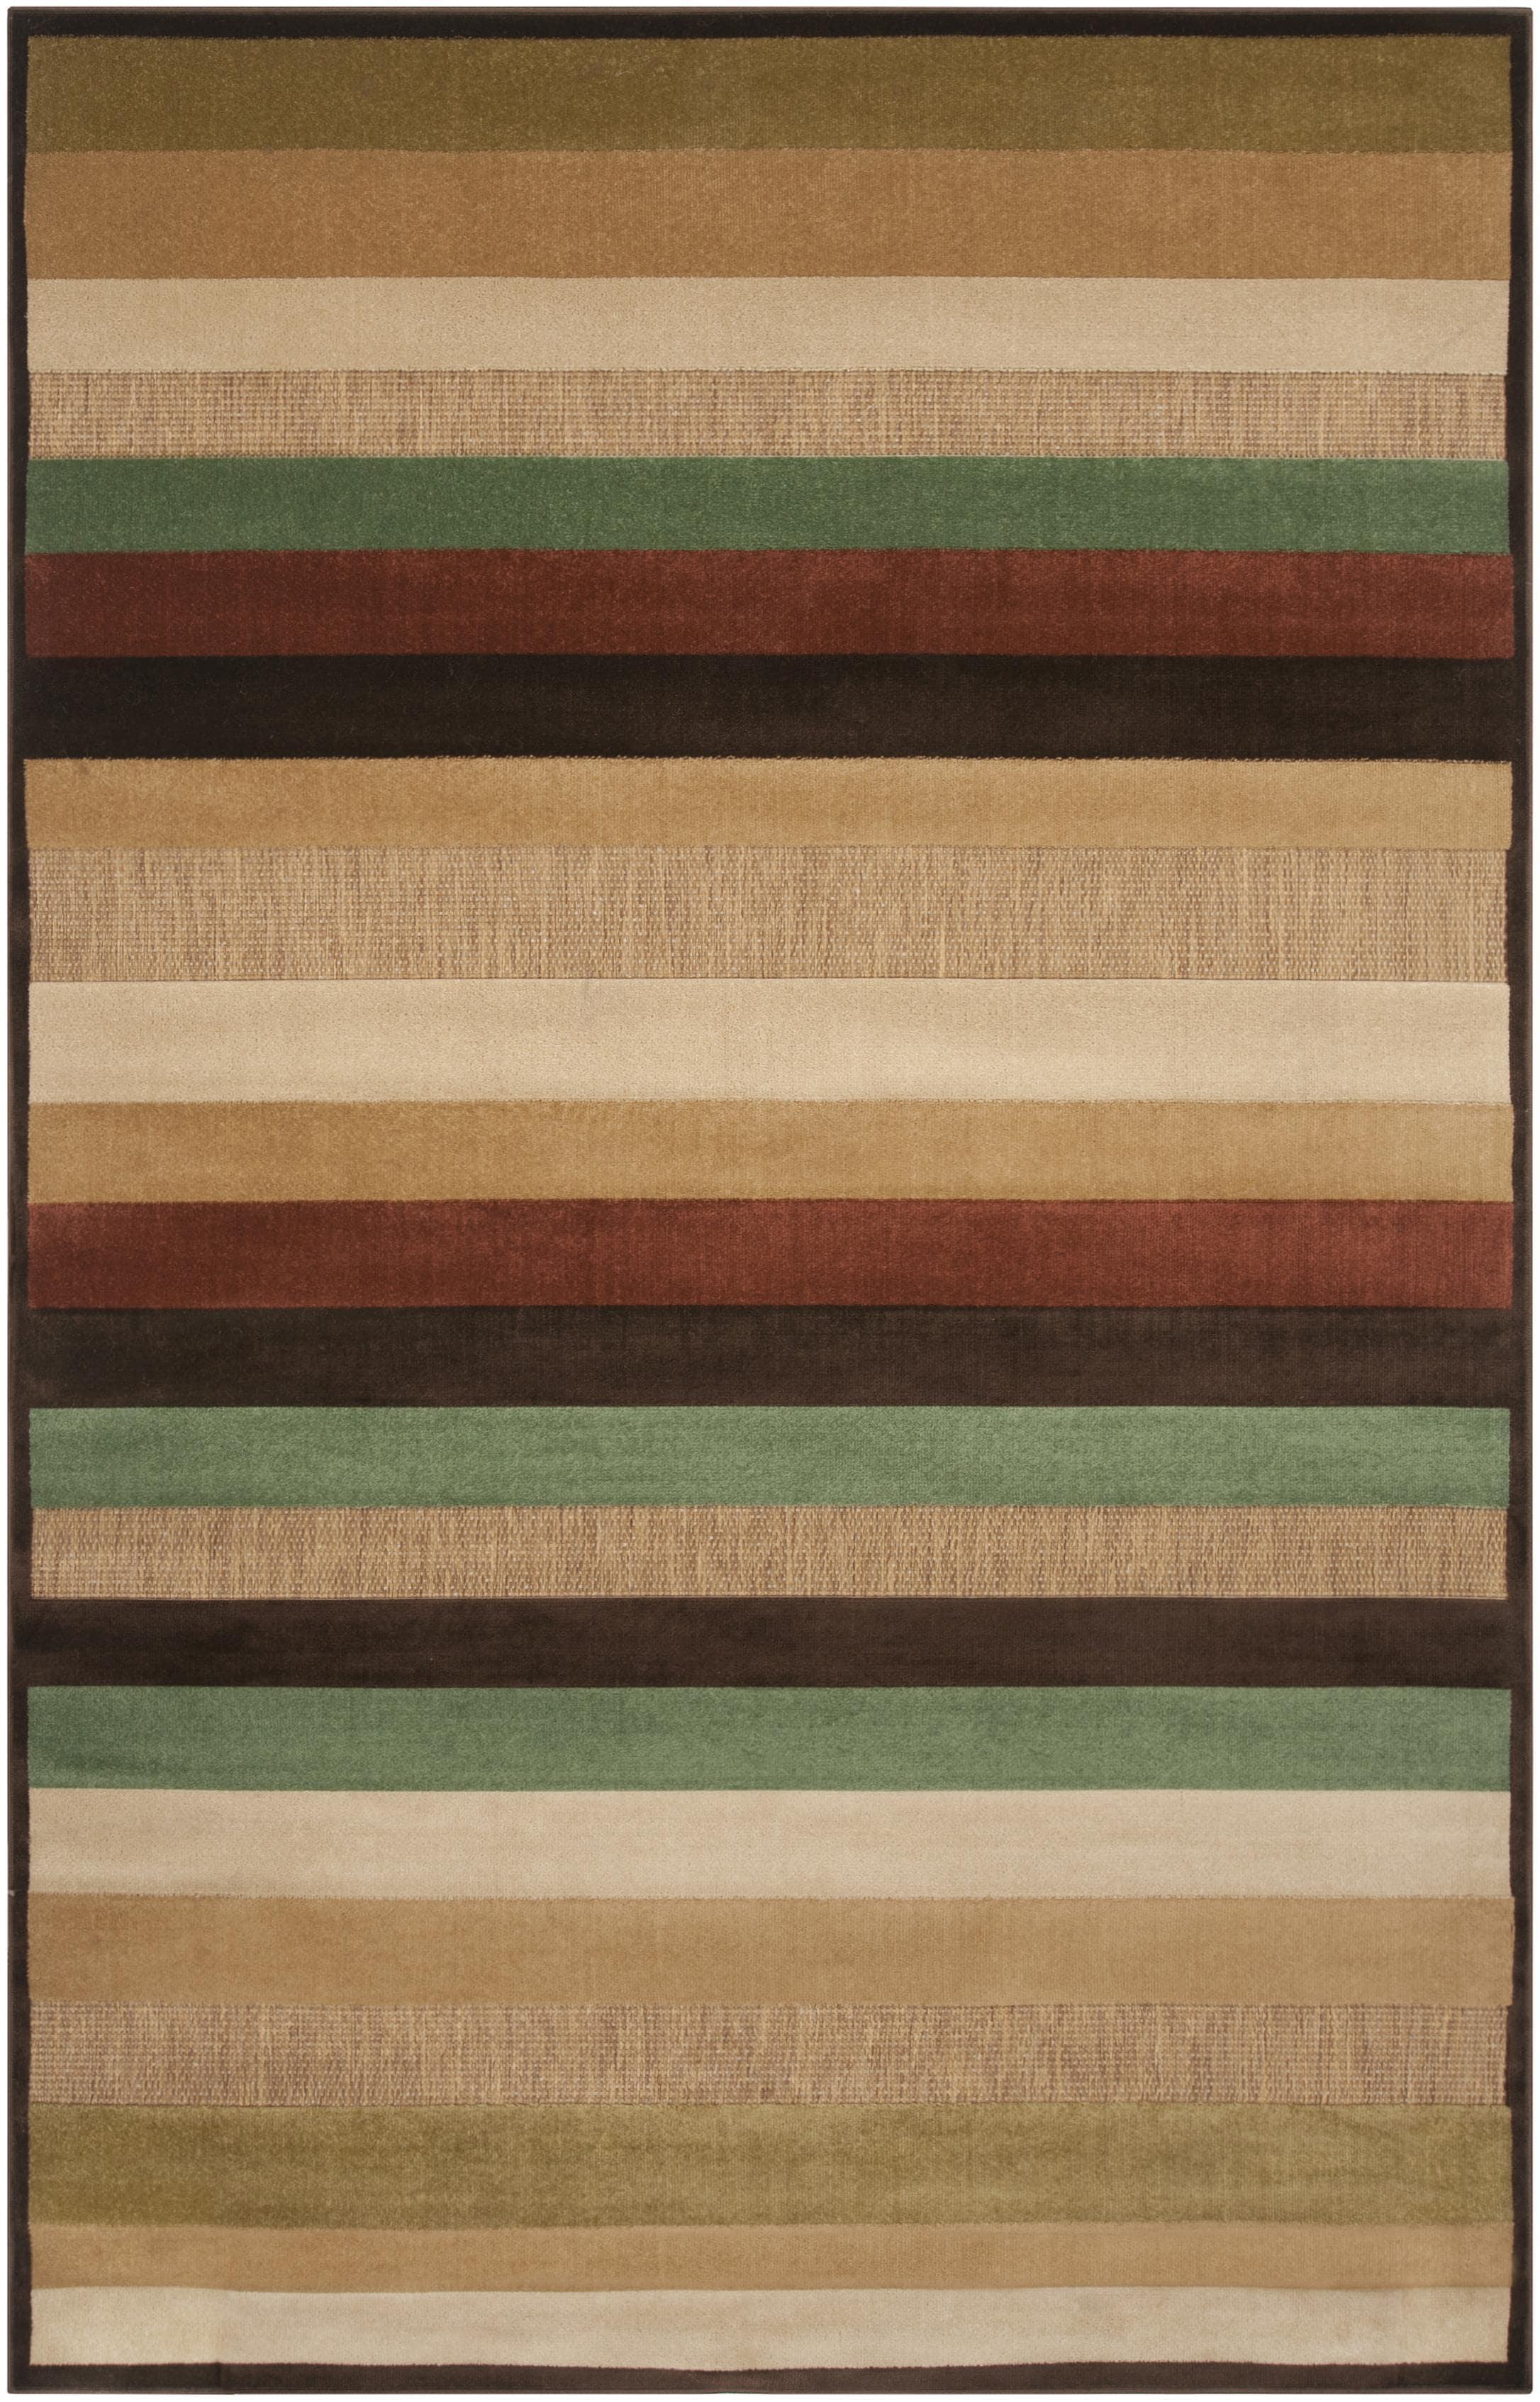 Woven Warm Stripes Natural Indoor/Outdoor Rug (8'8 x 12')